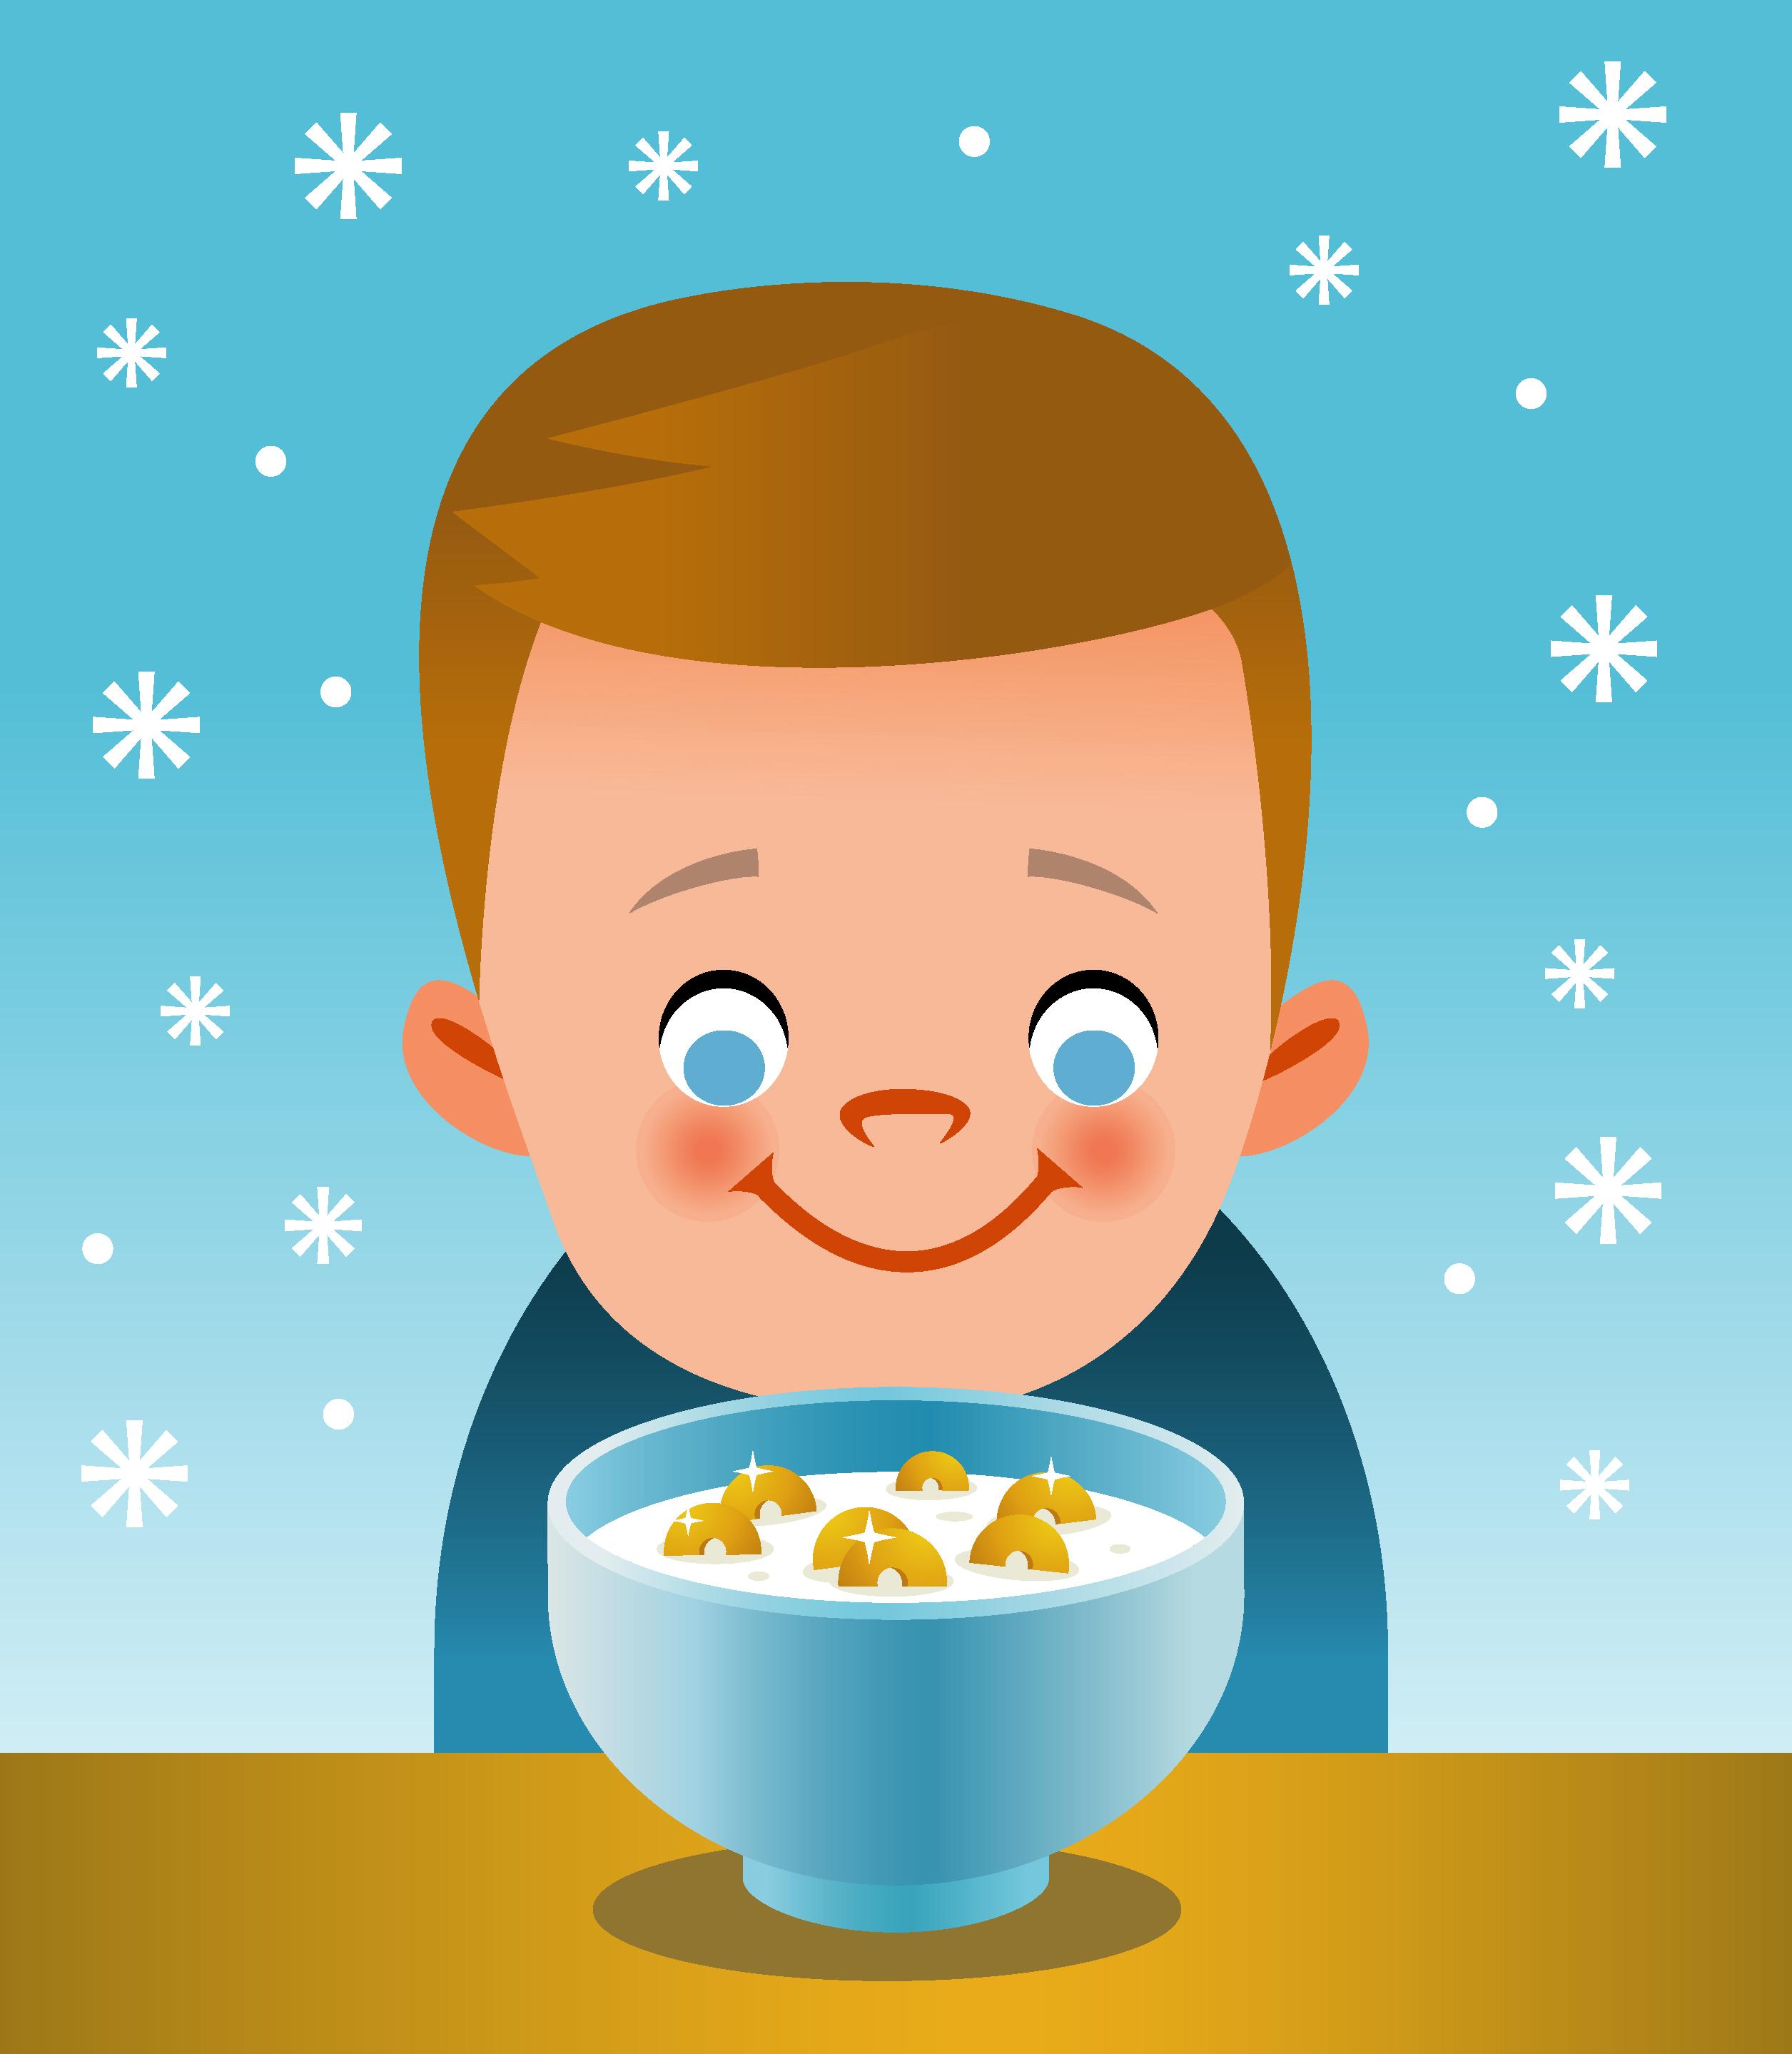 Are cartoons easier to swallow? – Hi Sugar!